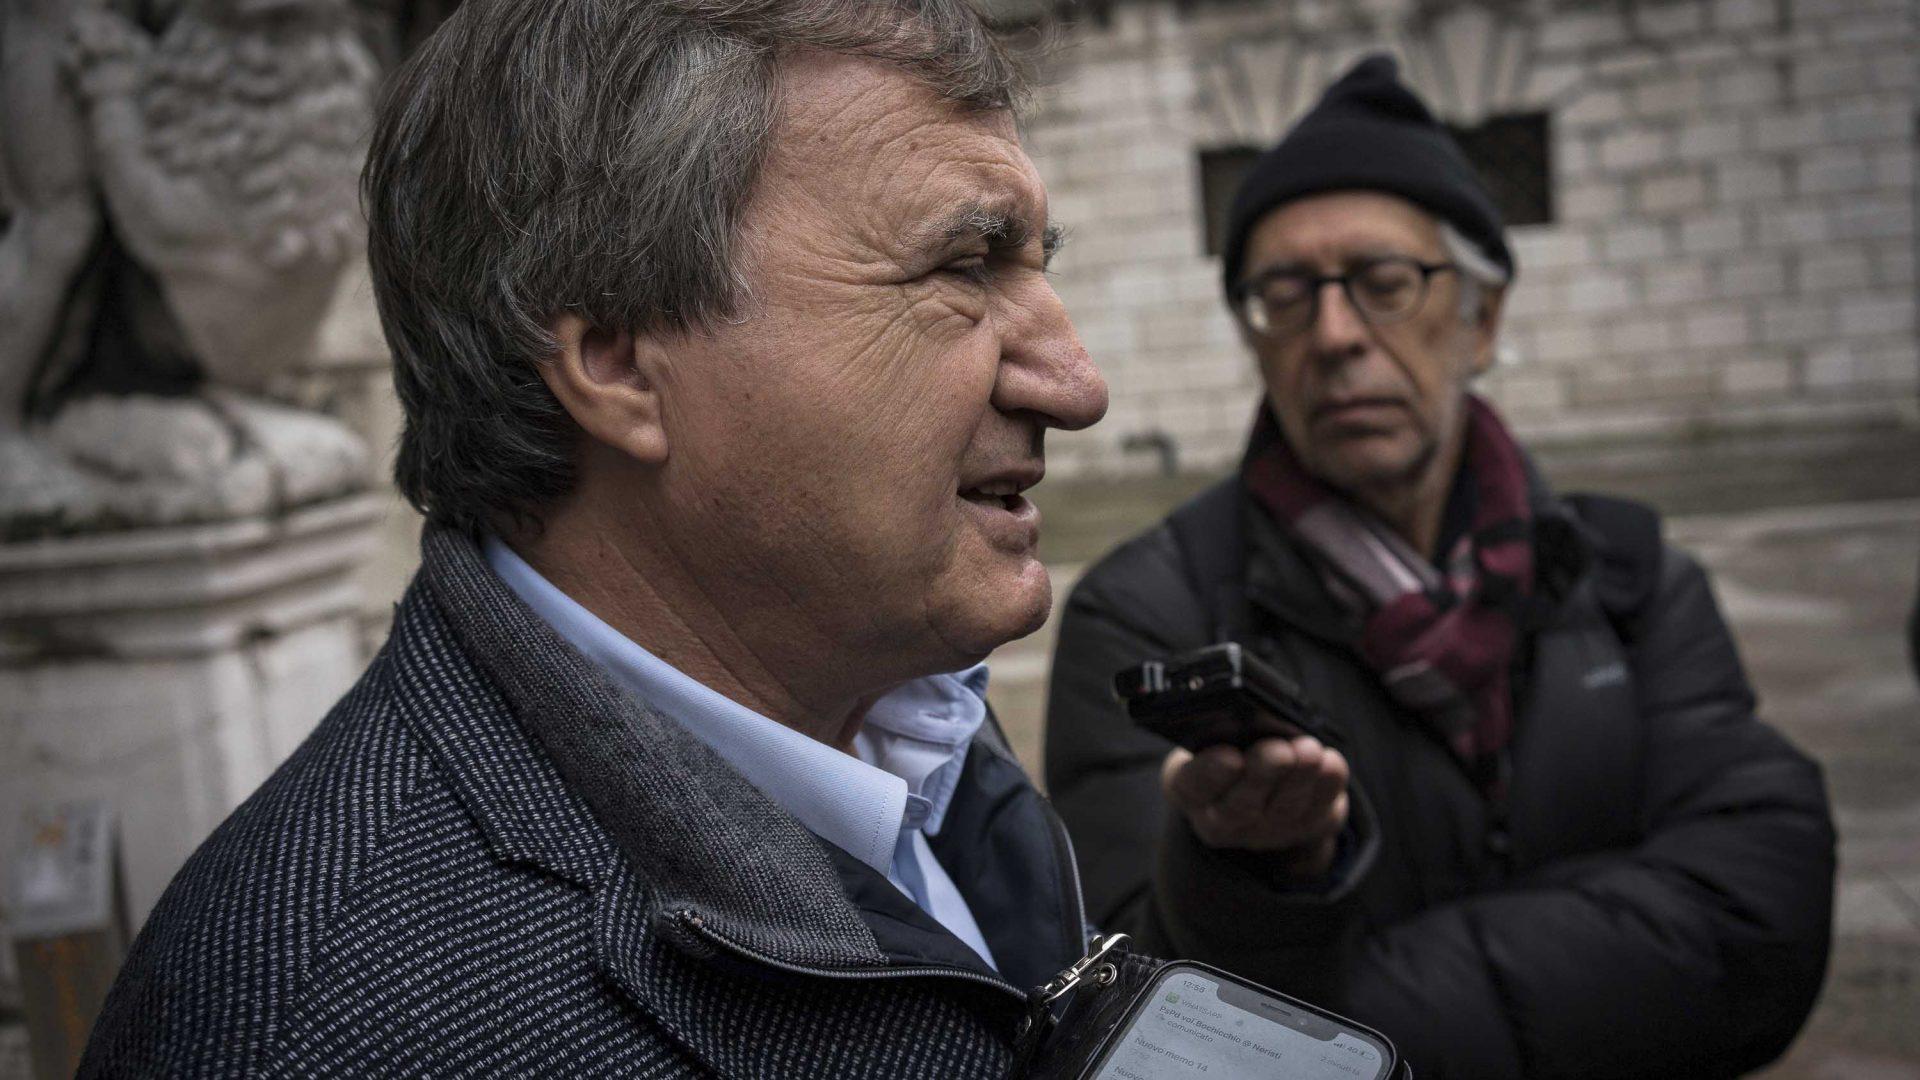 The current mayor of Venice, Luigi Brugnaro.